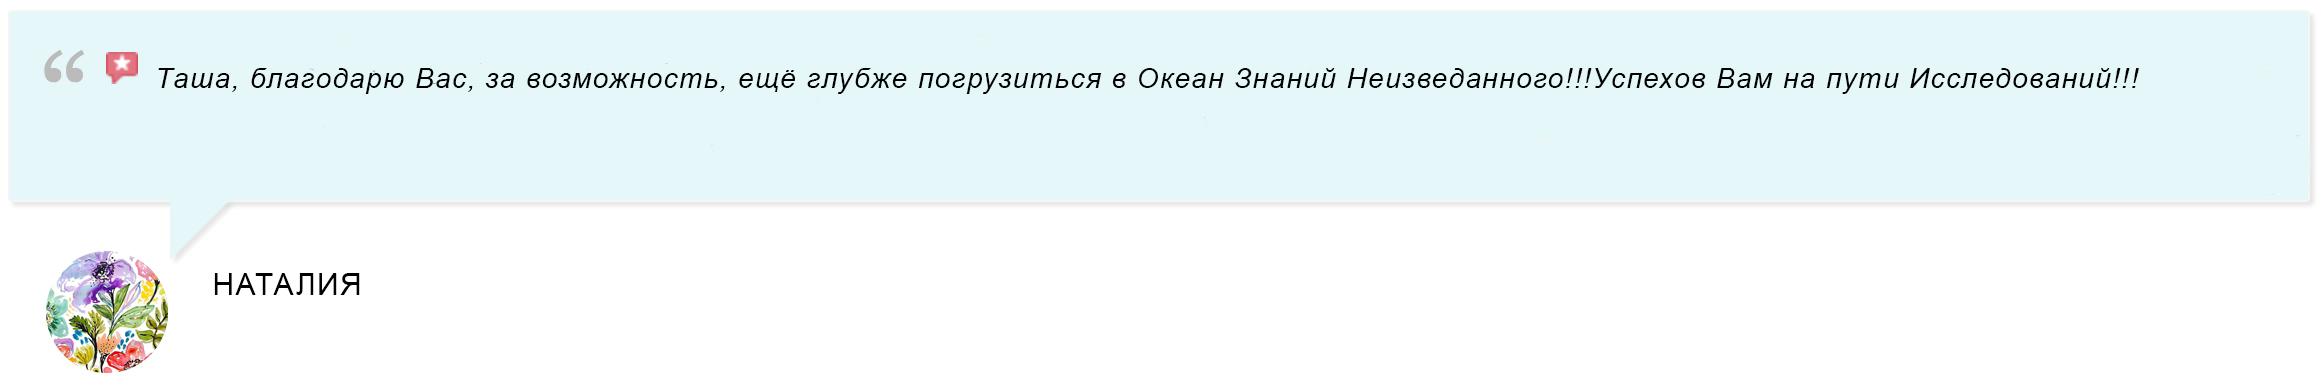 https://astrologtasha.ru/wp-content/uploads/2020/10/natalia_otzyv.jpg